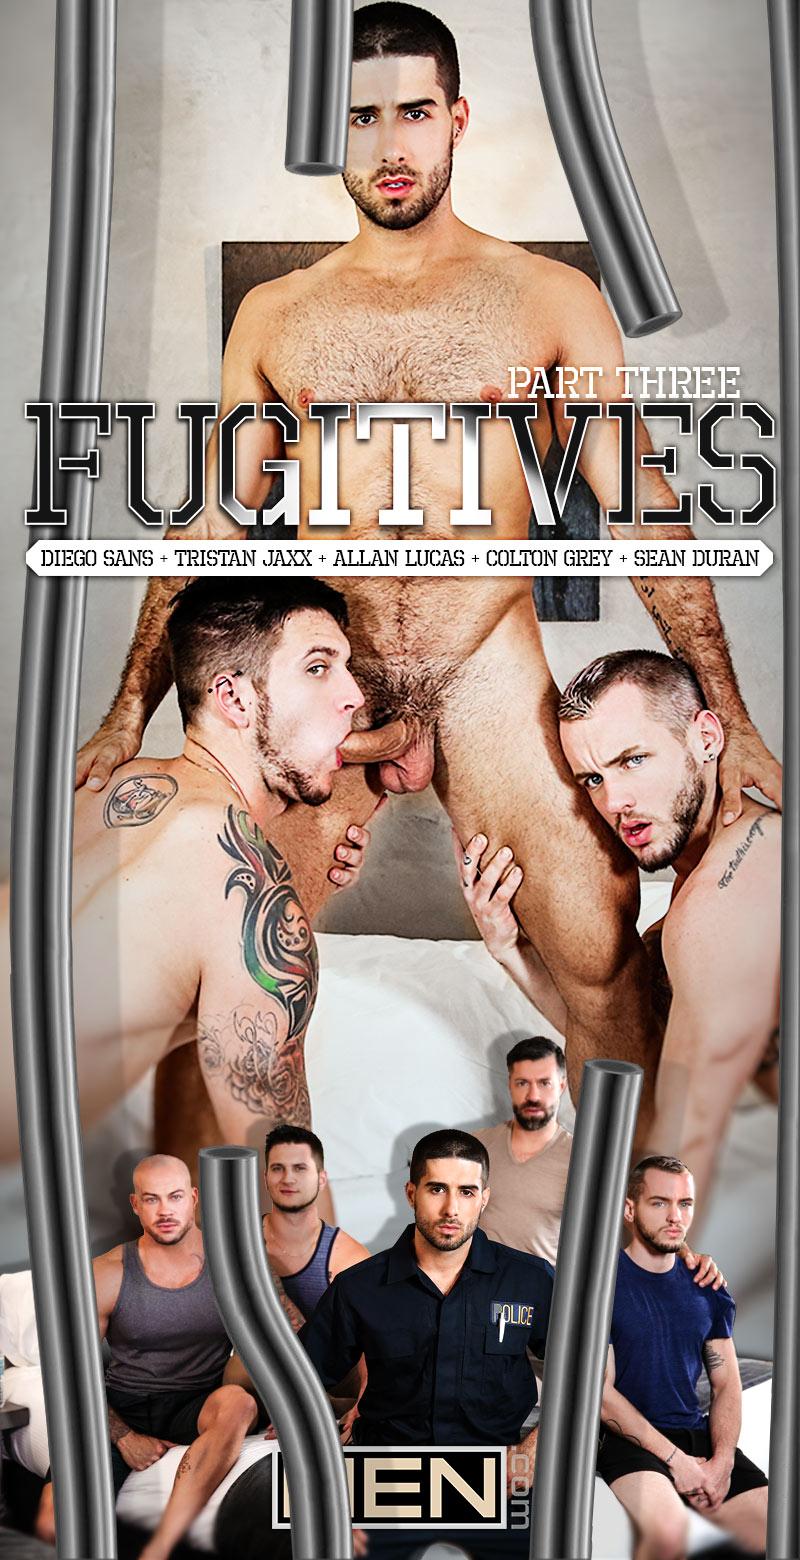 Fugitives, Part 3 (Diego Sans, Tristan Jaxx, Allan Lucas, Colton Grey and Sean Duran) at Jizz Orgy